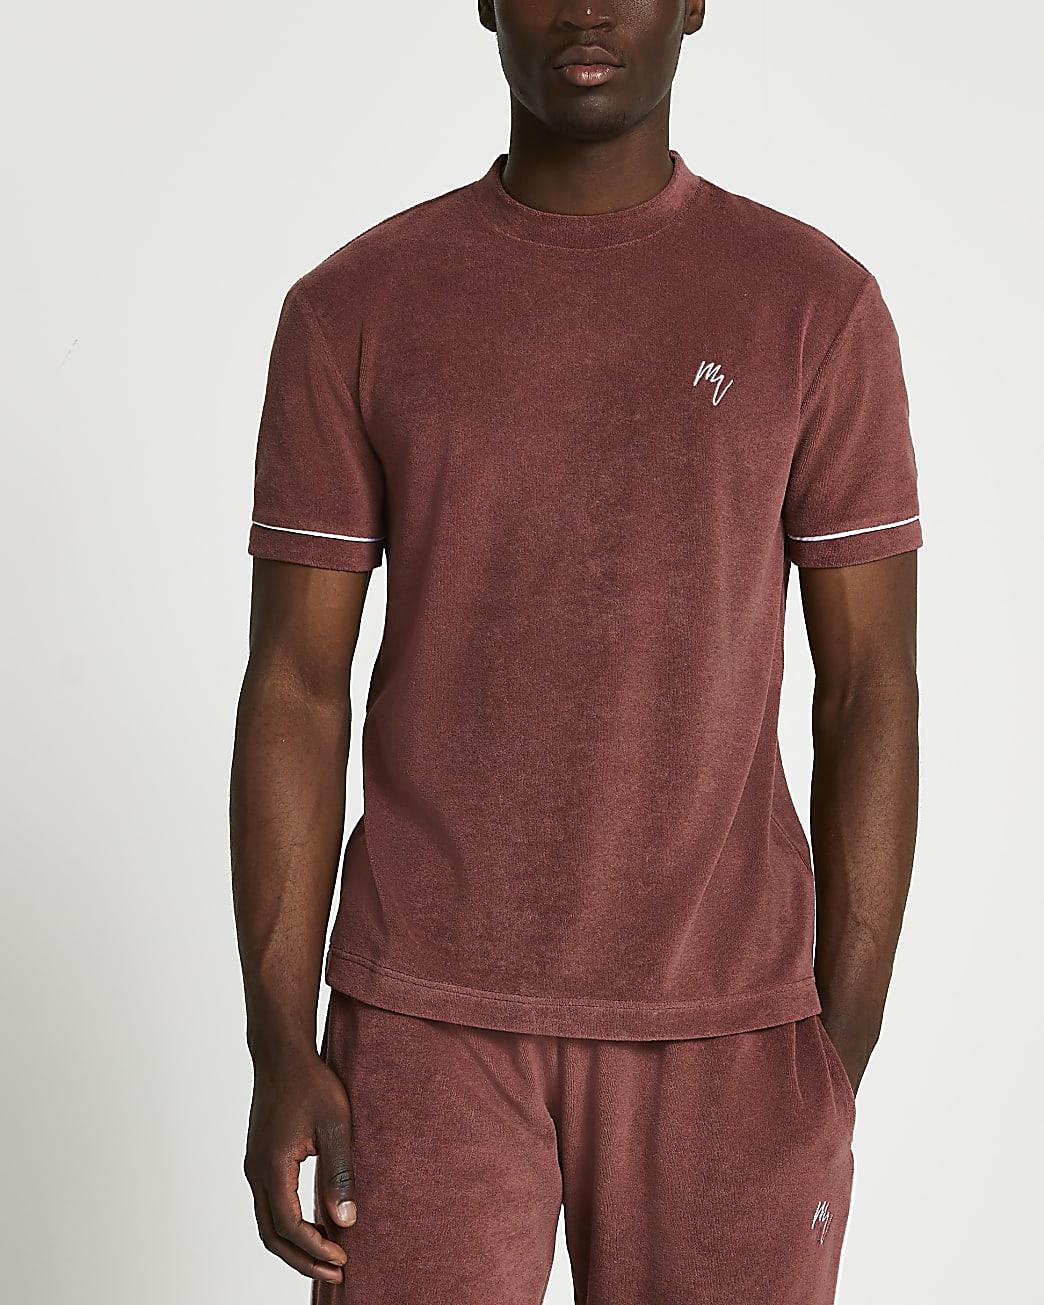 Maison Riviera rust slim towelling t-shirt